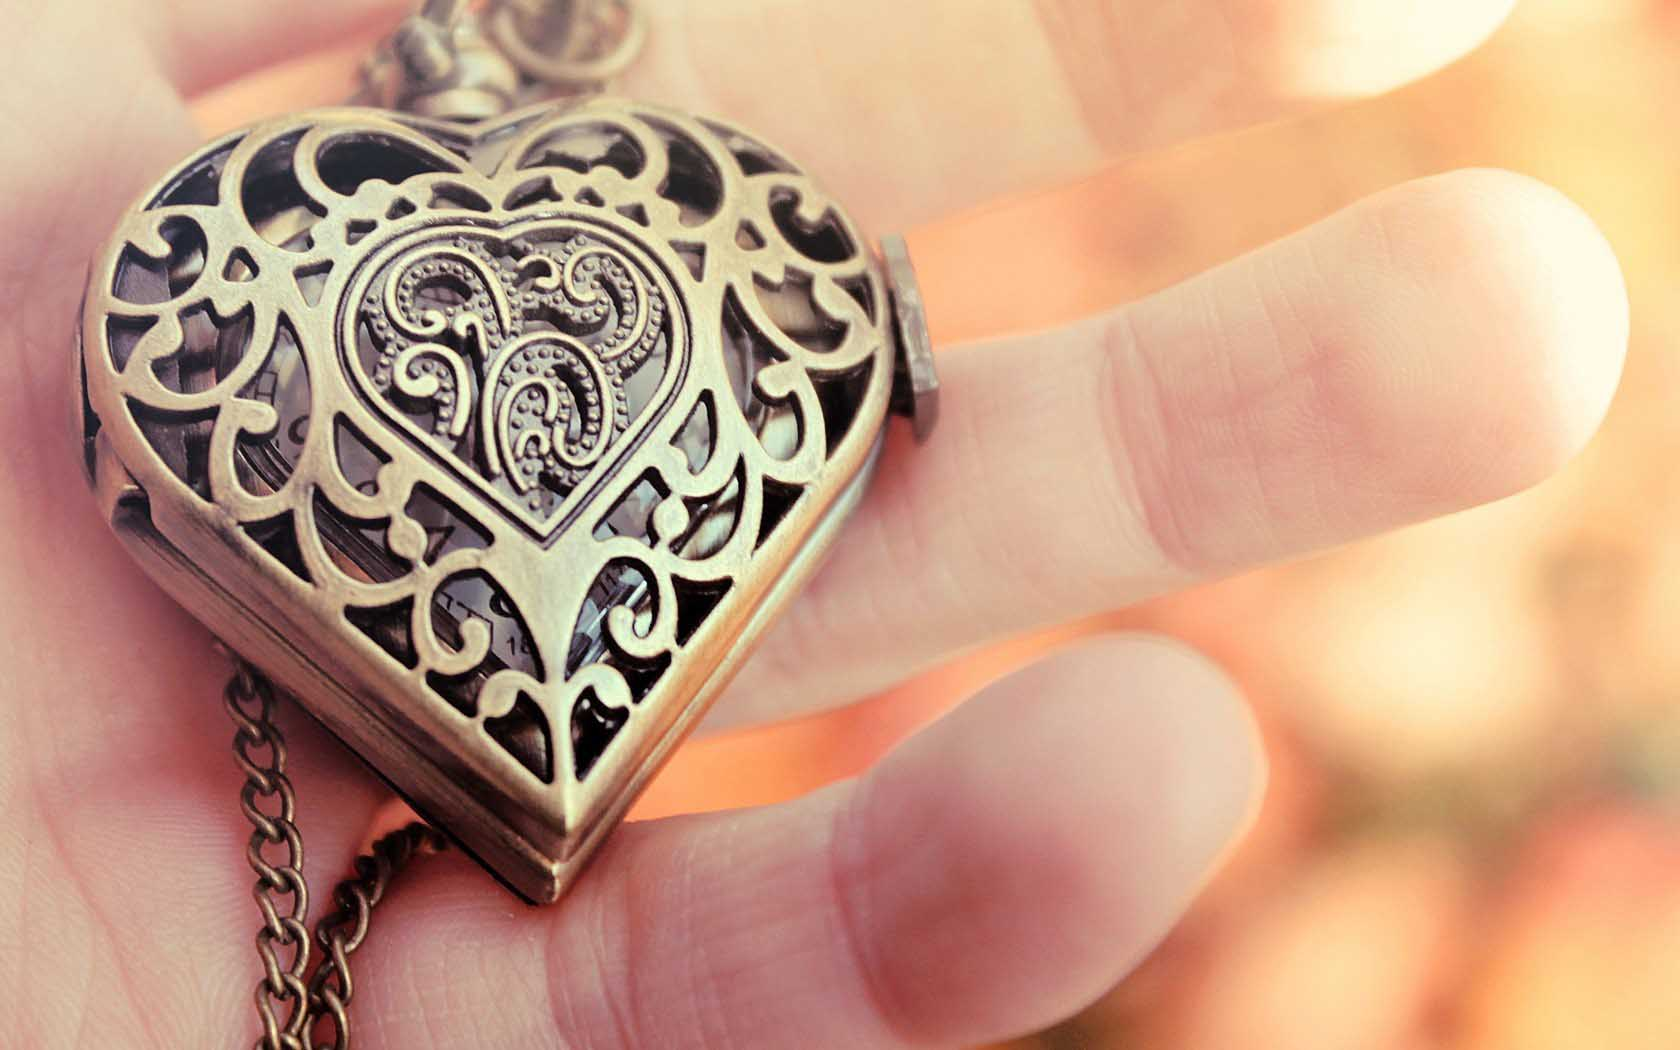 Cute Love Lockets Wallpapers Love Hearts Jewelry 25 Wide Wallpaper Hdlovewall Com